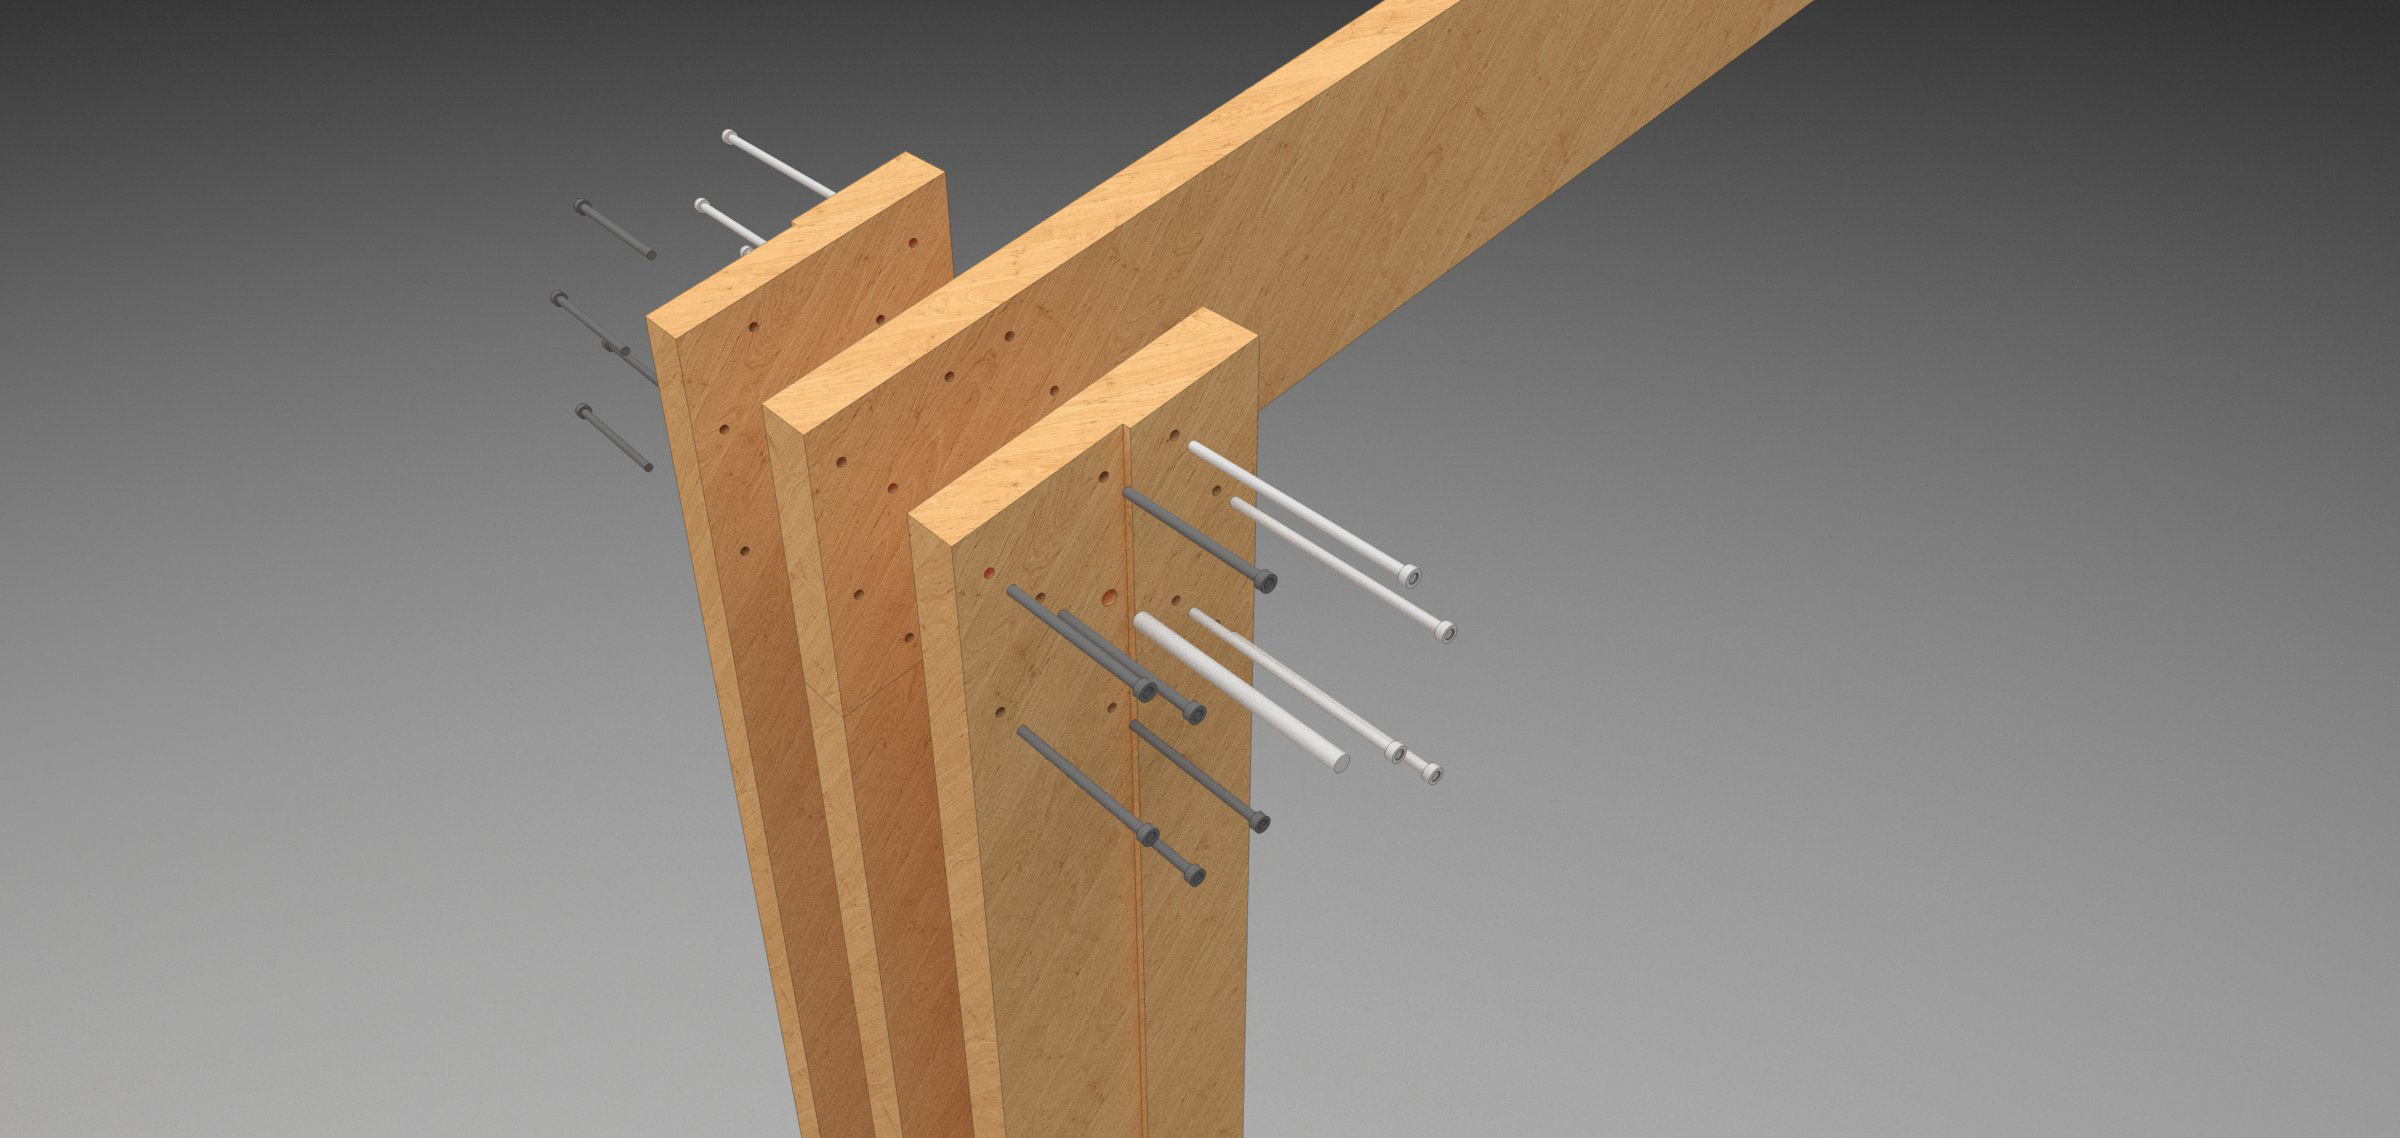 Portal Frame Construction